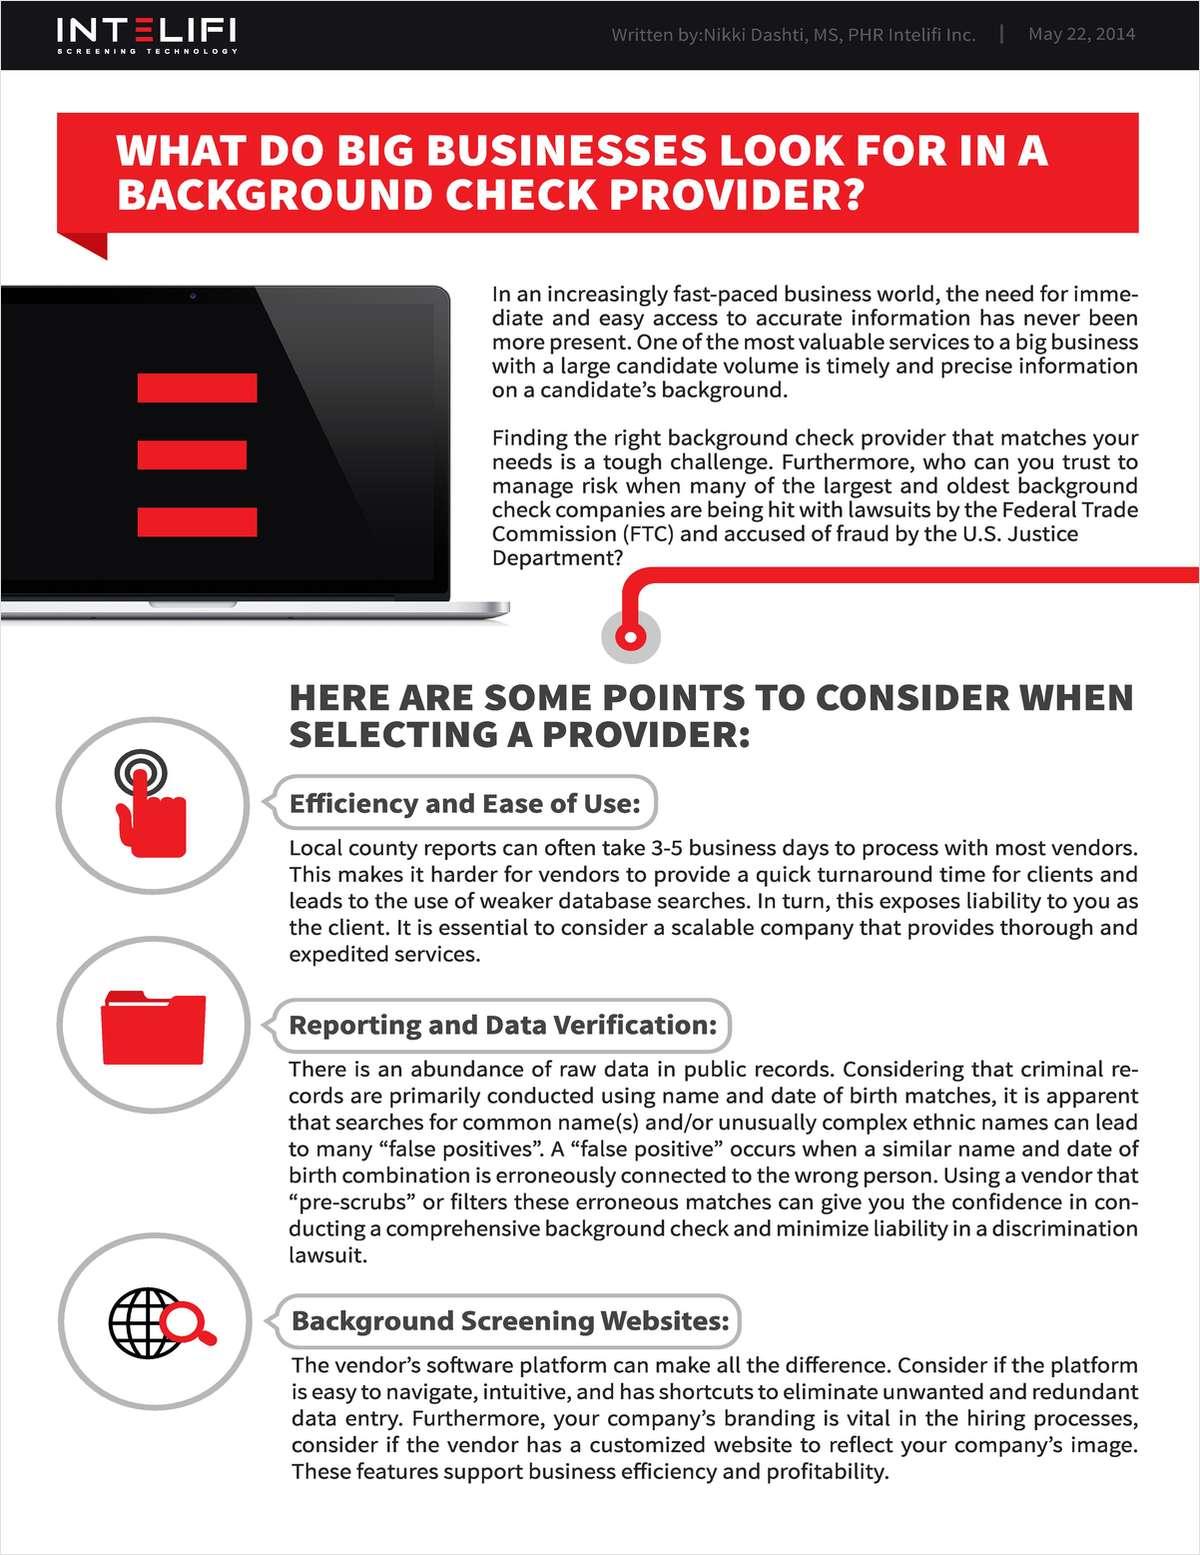 Do you run 100's of background checks?